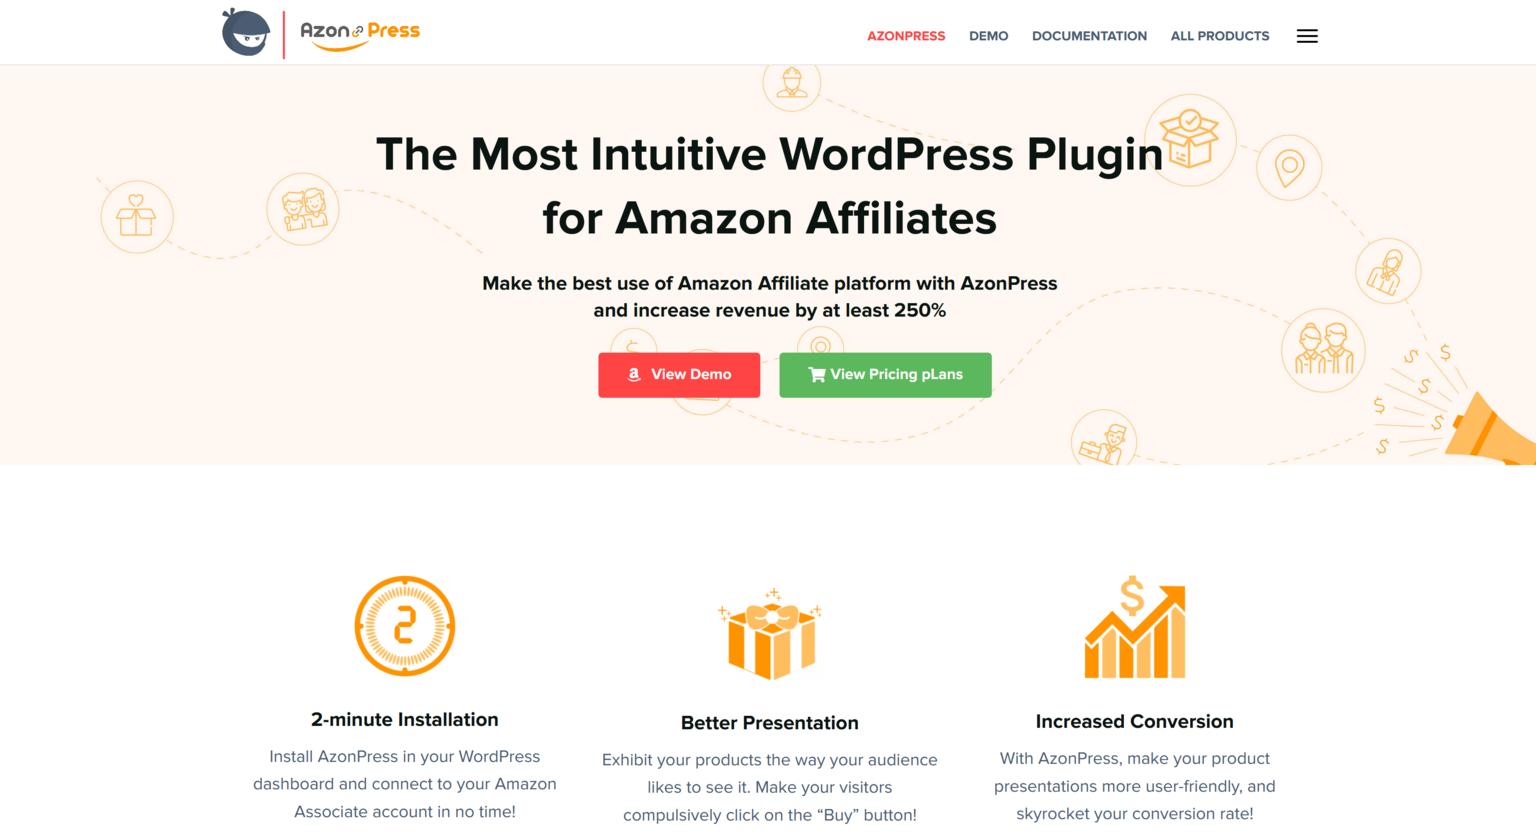 AzonPress 1.7.1 – Intuitive WordPress Plugin for Amazon Affiliates